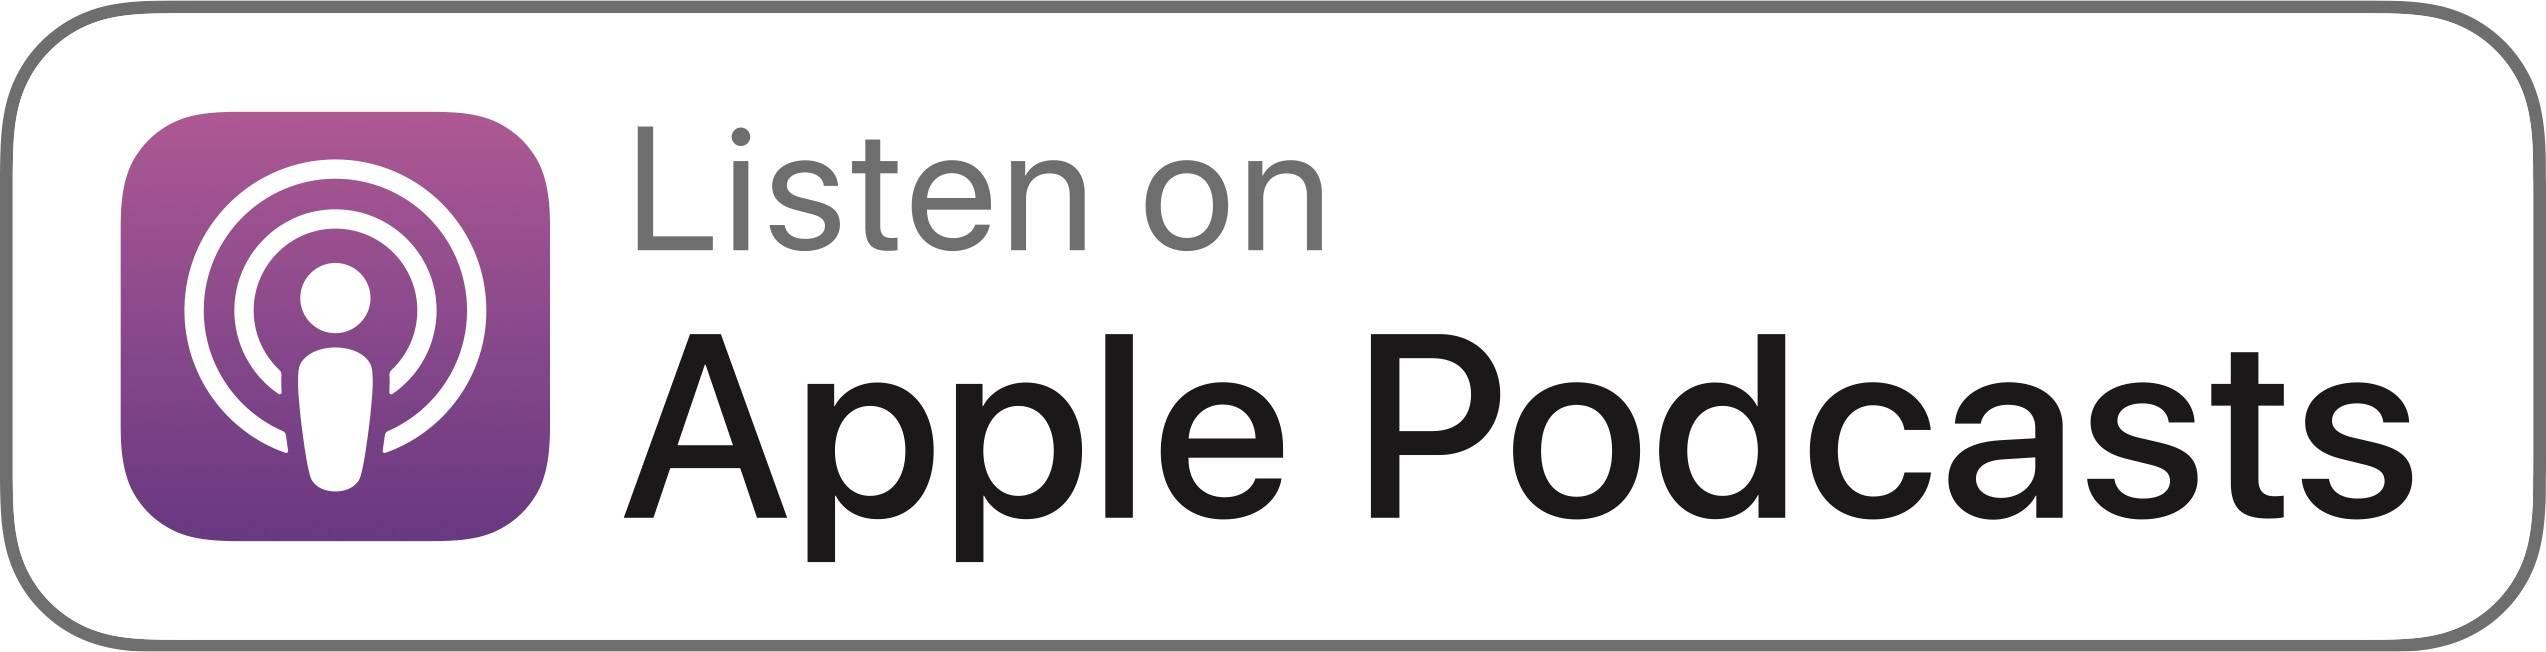 Listen-on-Apple-Podcasts-badge (1)